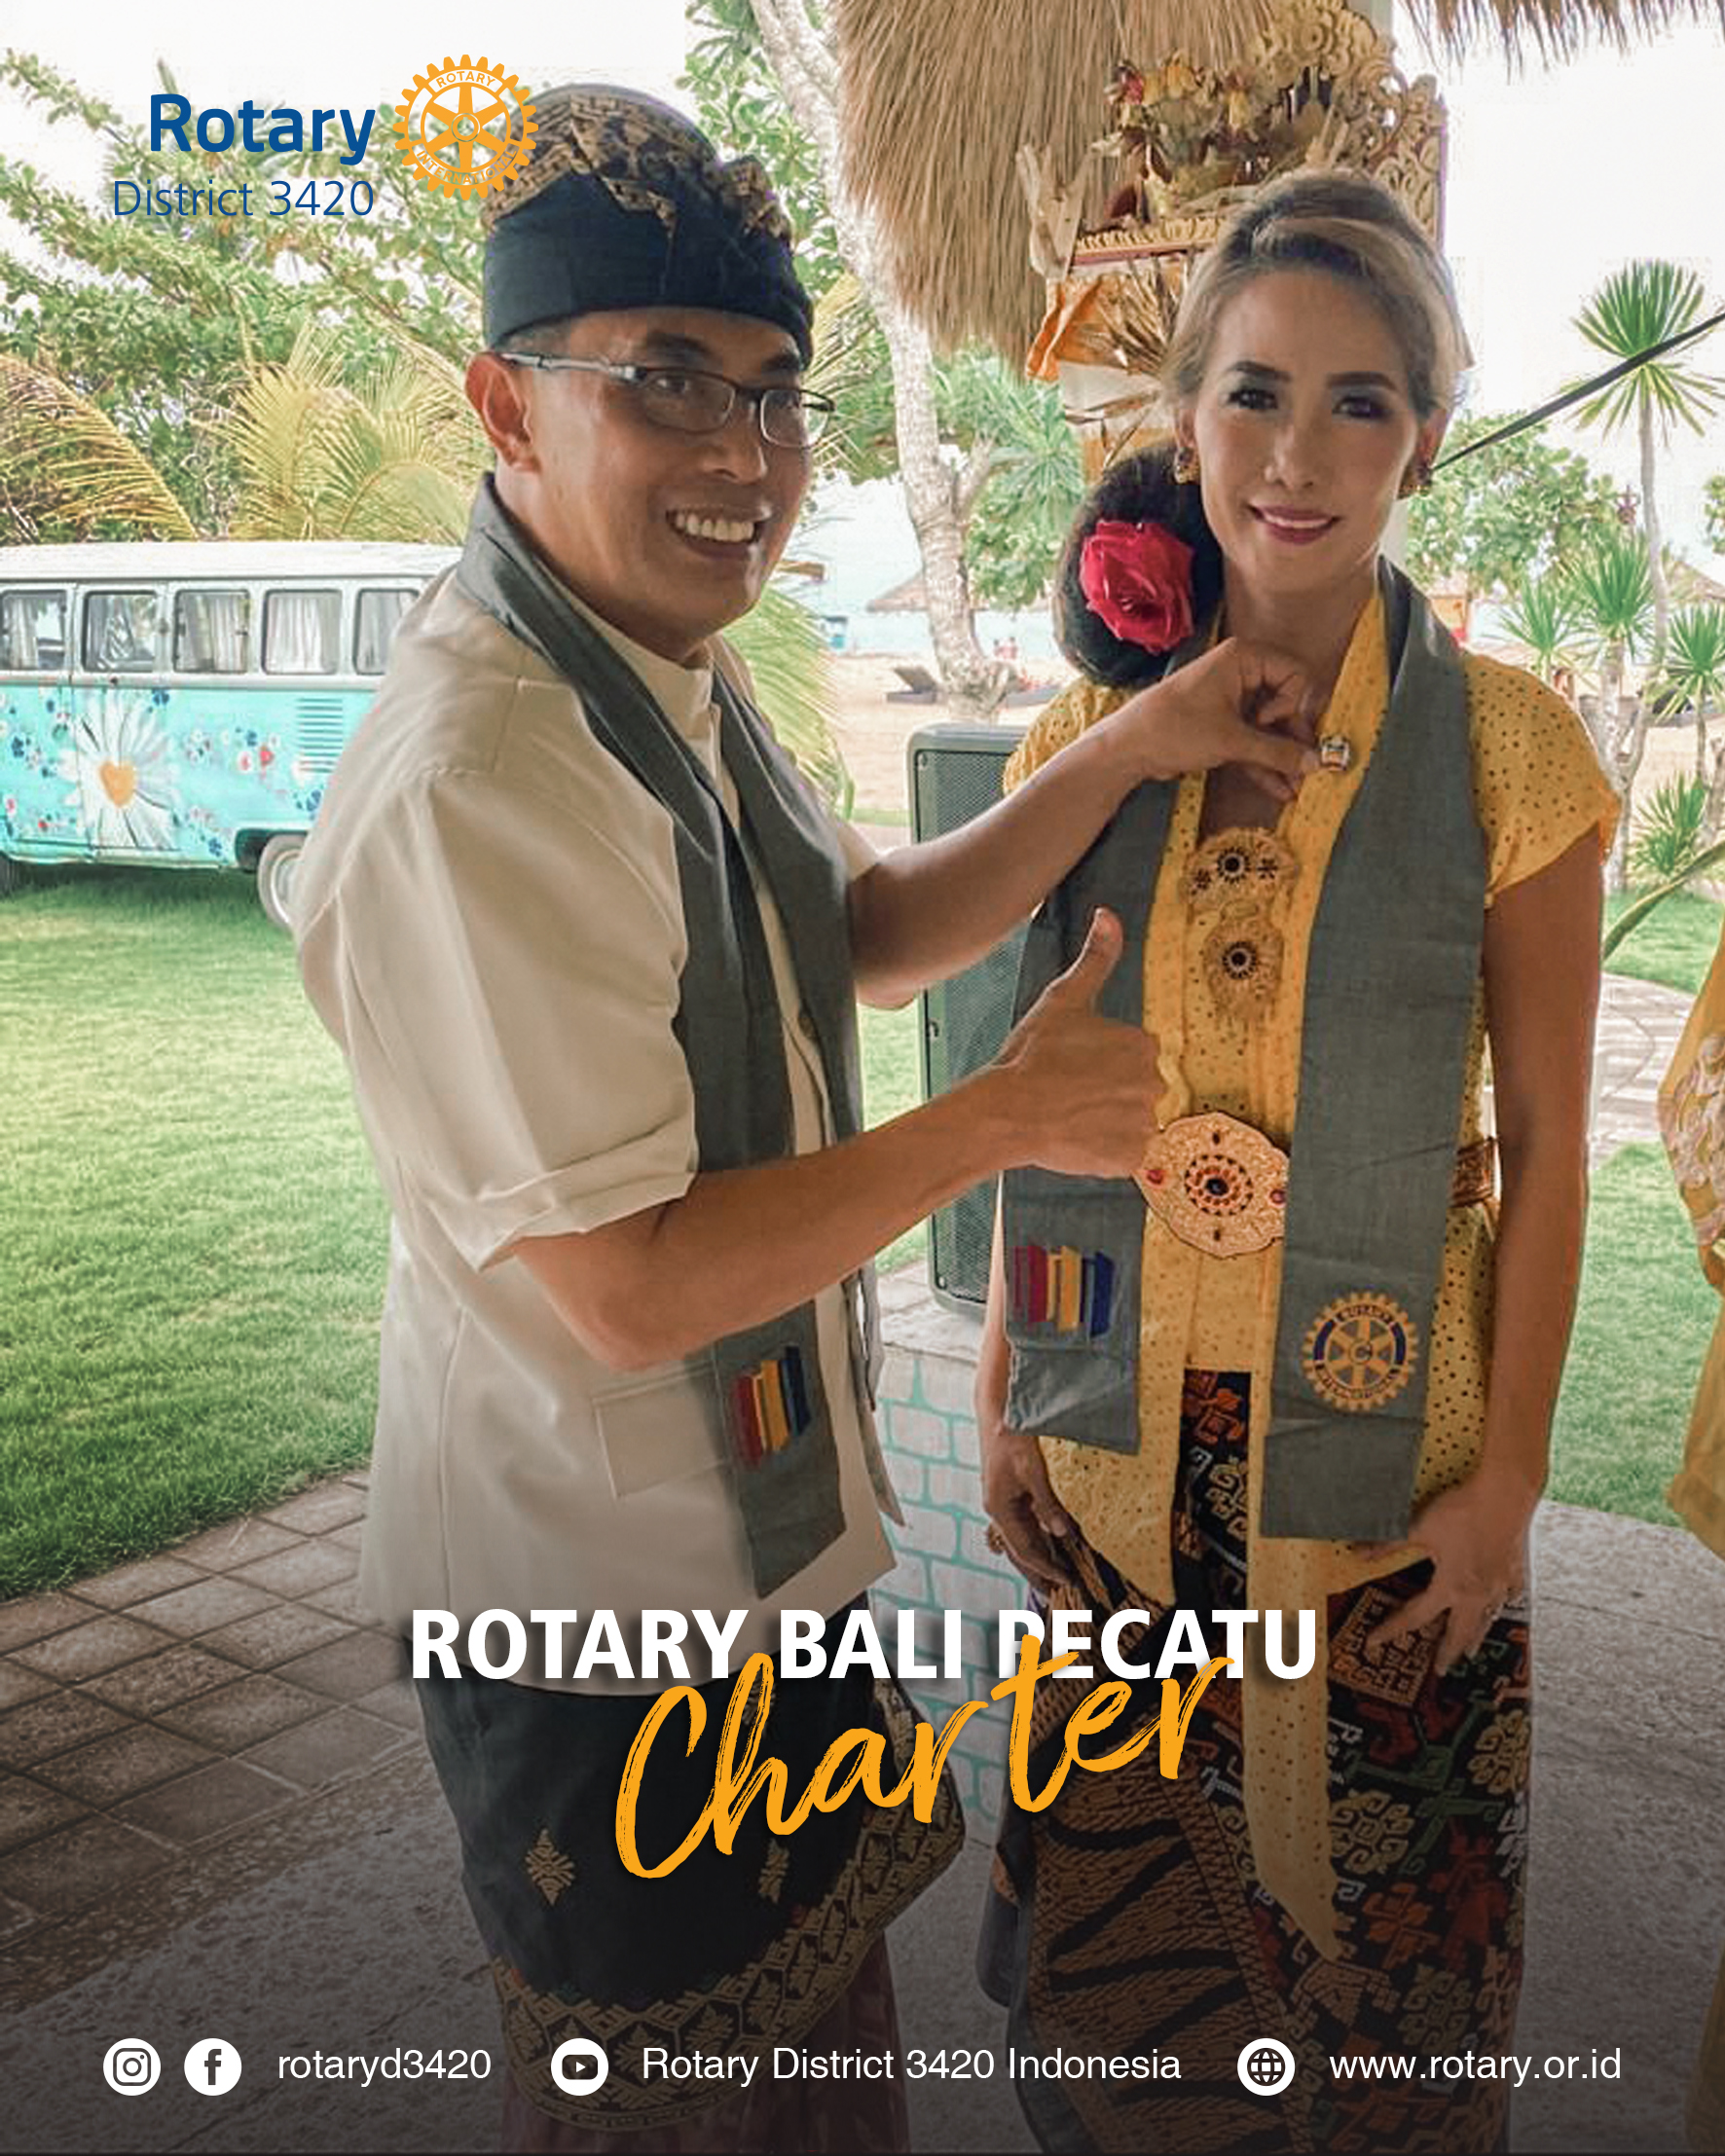 Charter Presentation Rotary Club of Bali Pecatu